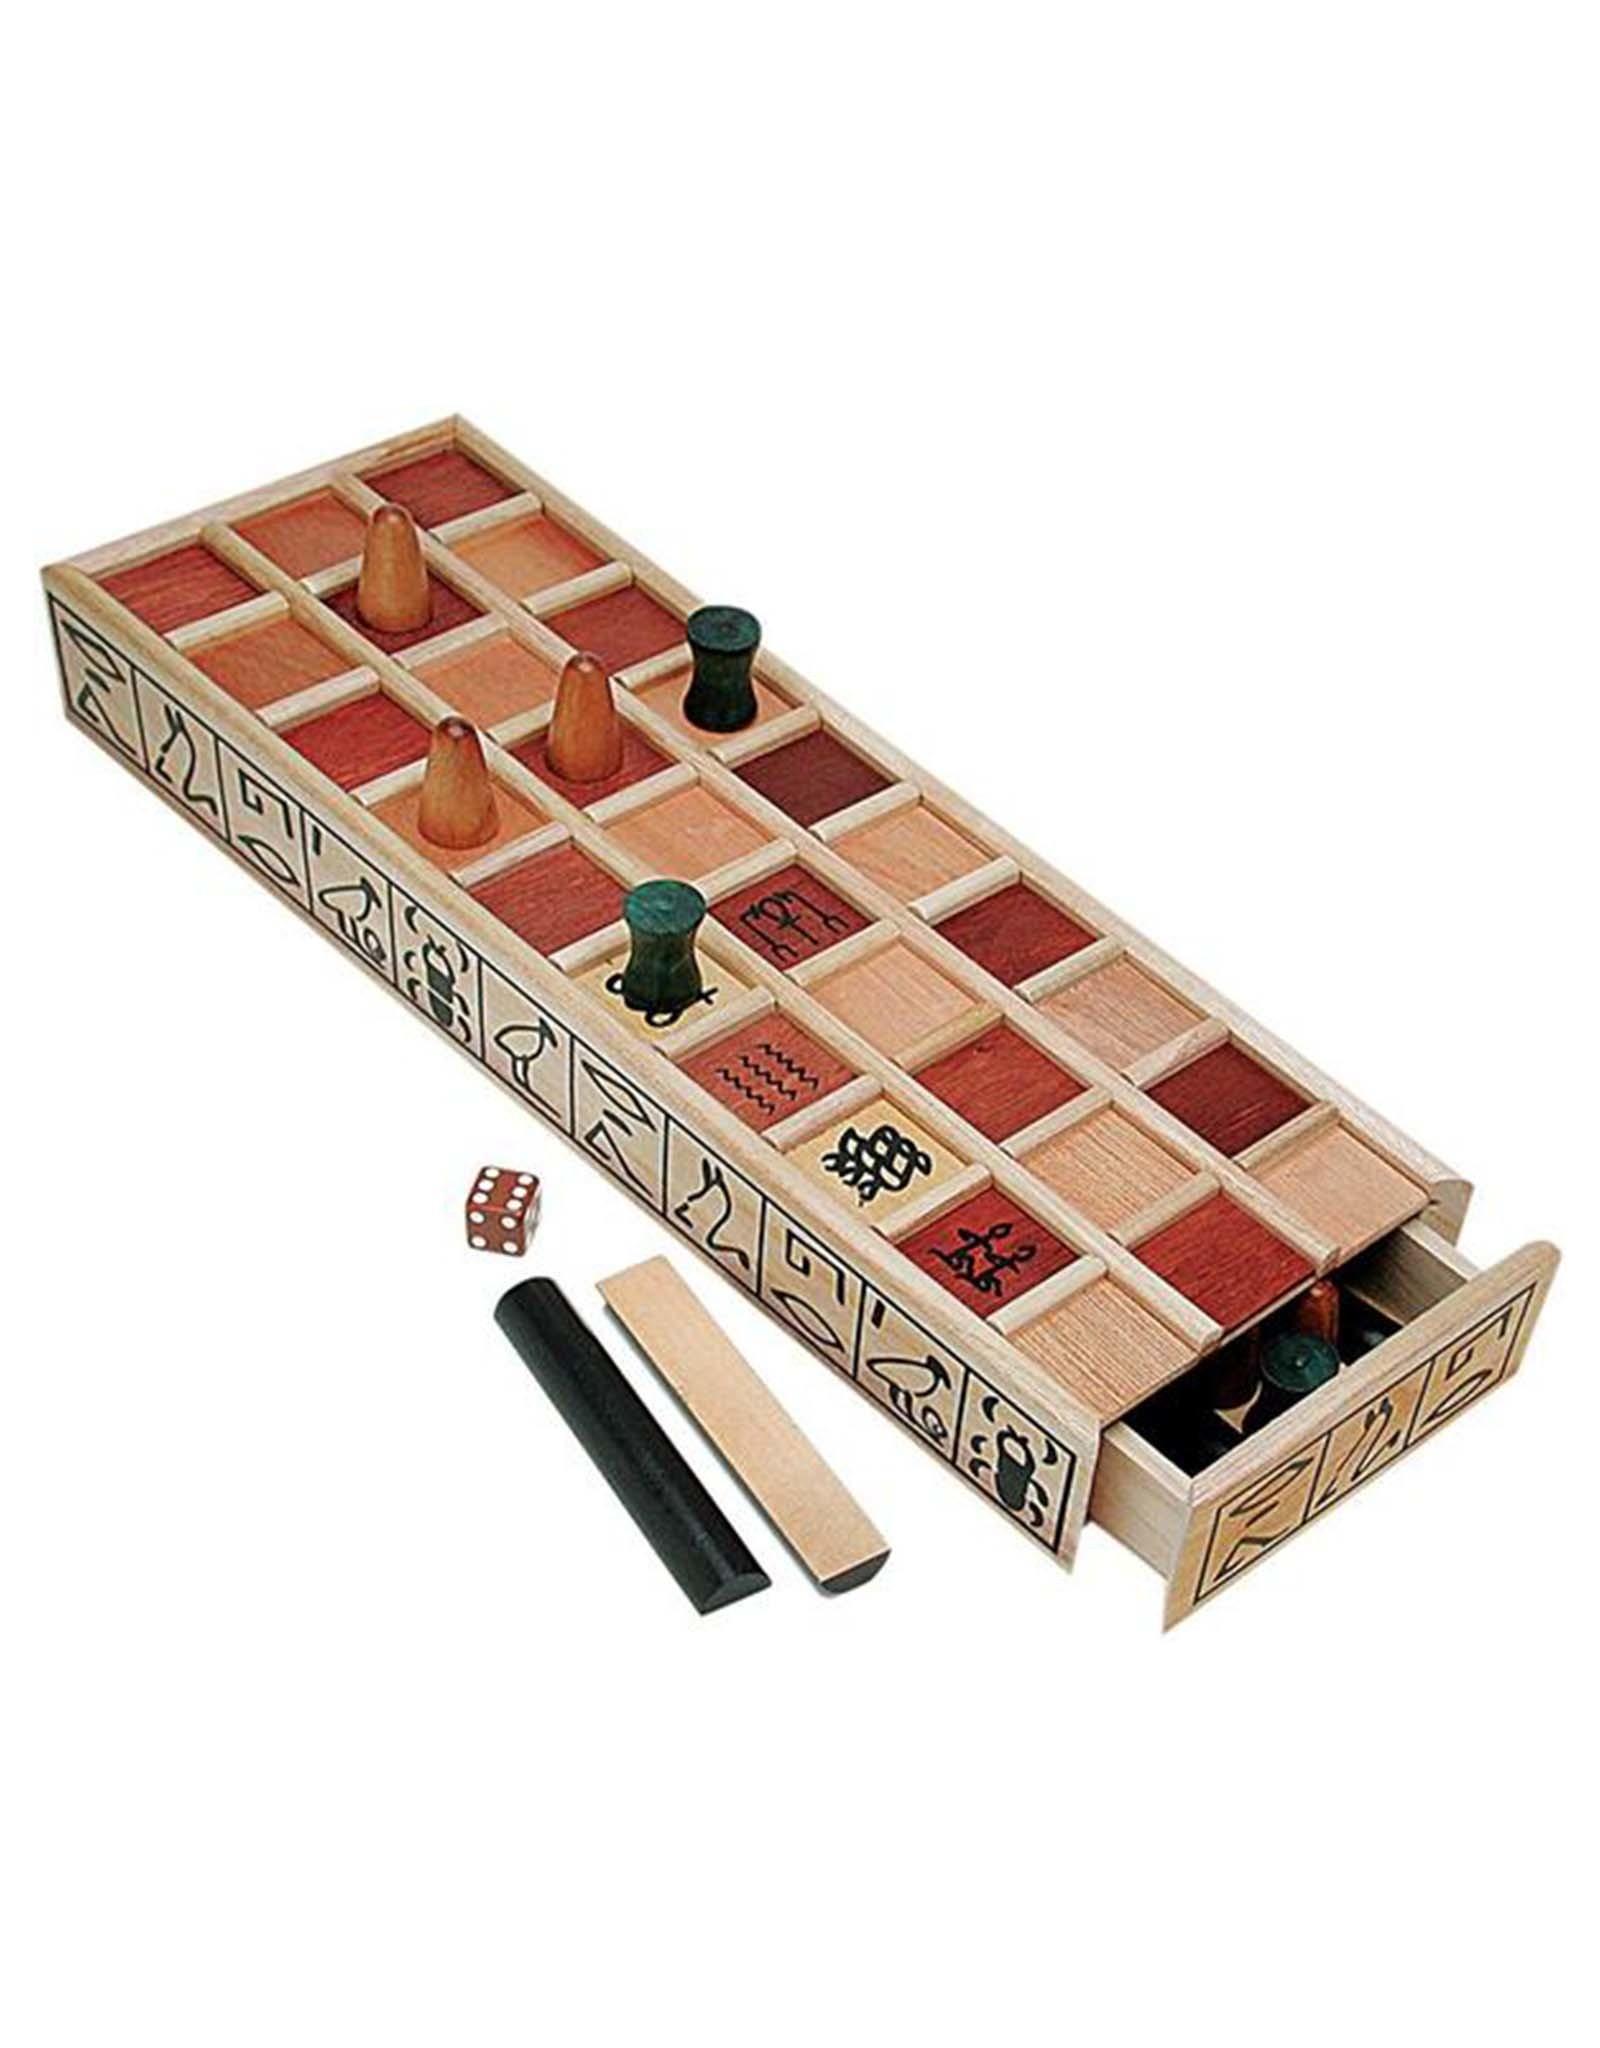 Senet Ancient Egyptian Game